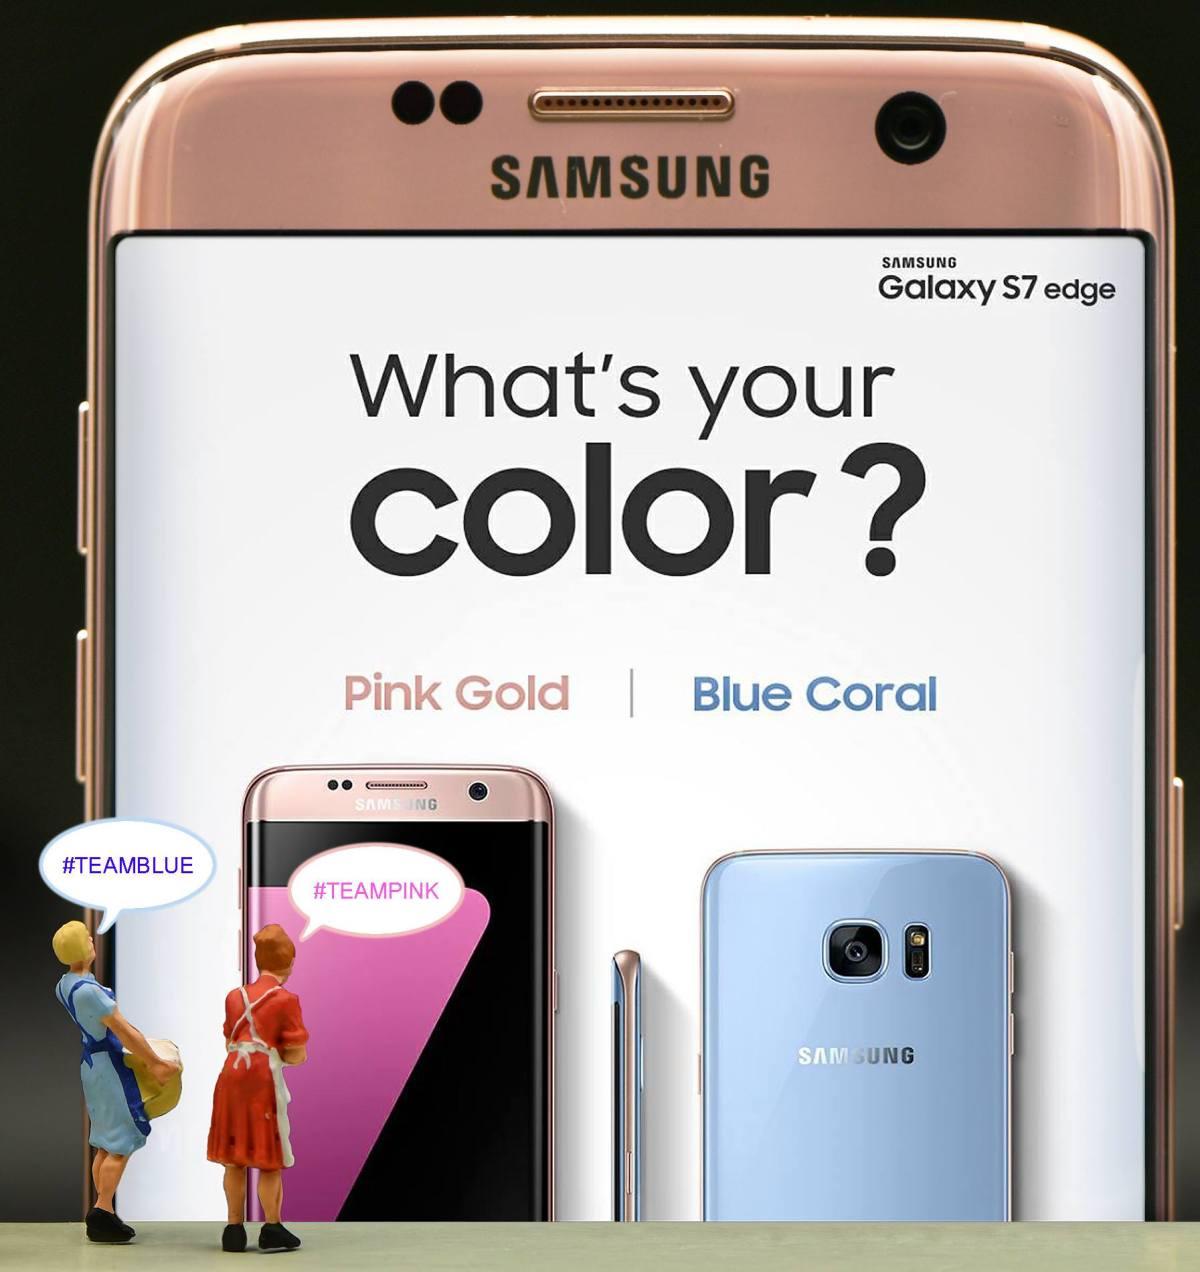 samsunggalaxys7edge1 เล่นเรื่องเล็กให้เป็นเรื่องใหญ่ผ่านภาพถ่ายสไตล์ Miniature People Photography กับคนตัวจิ๋ว x Samsung Galaxy S7 edge